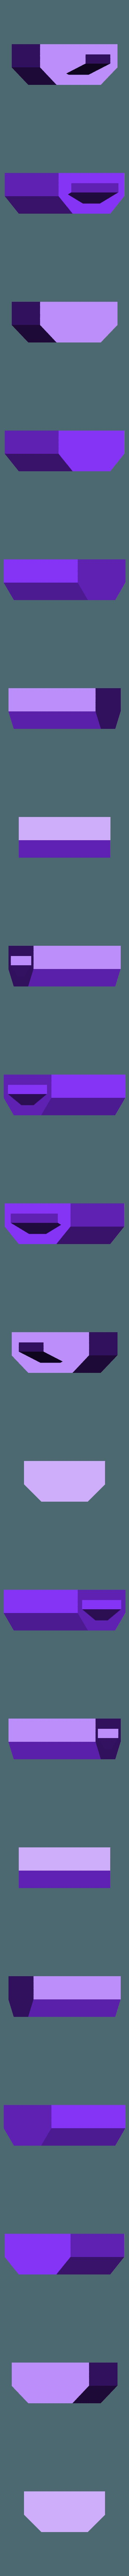 Wide_Intake.stl Download free STL file Gaslands Greebles (Blowers and Burners) • Design to 3D print, Ellie_Valkyrie